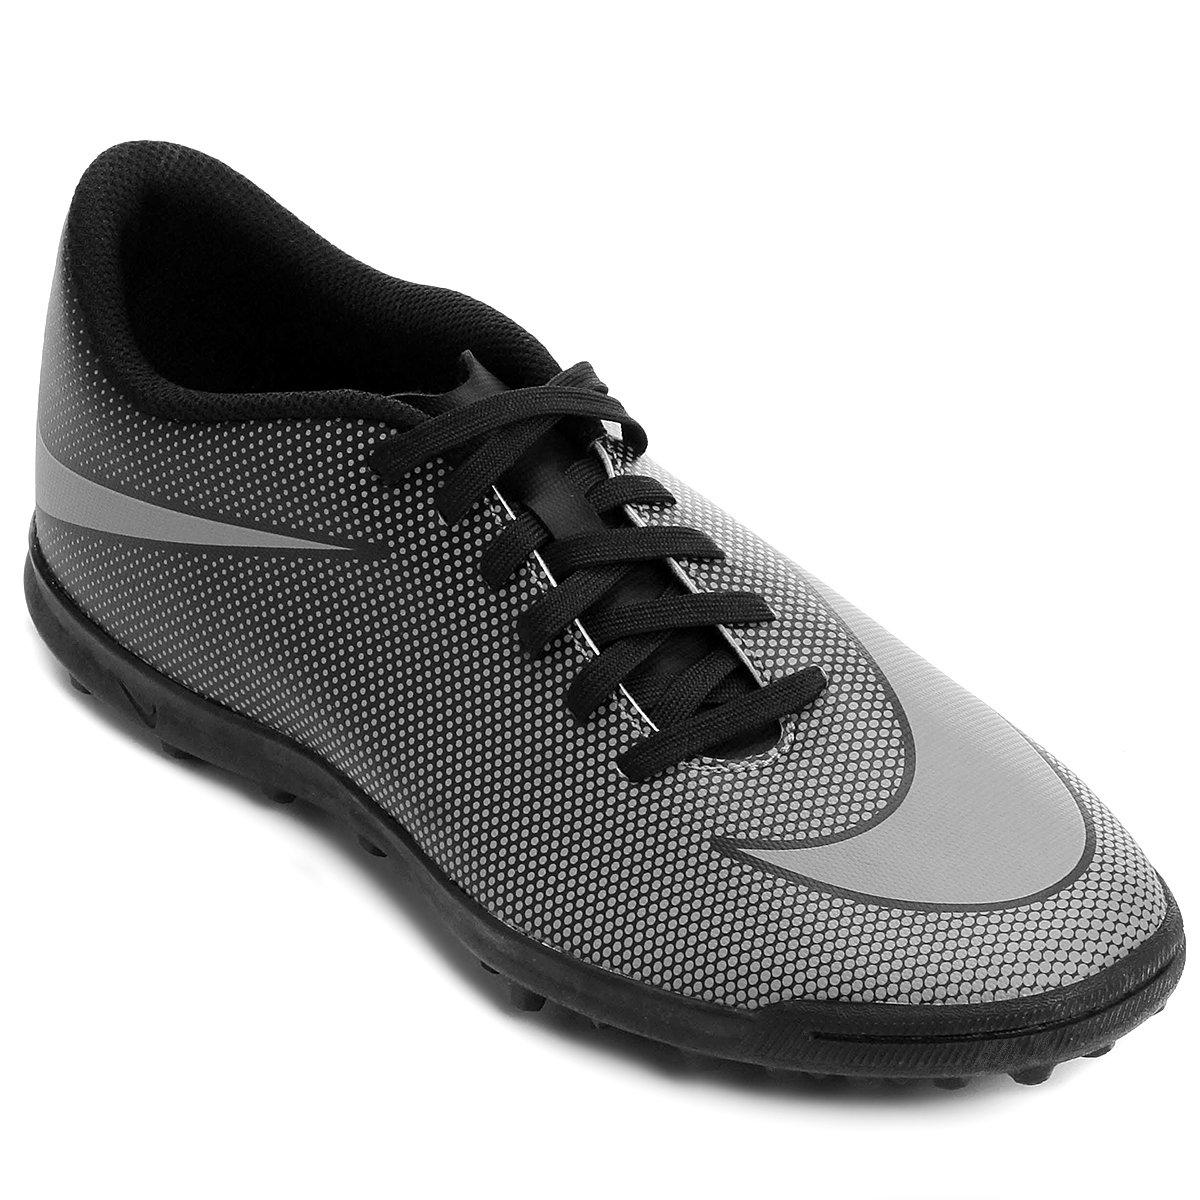 21511de2a9 Chuteira Society Nike Bravata 2 TF